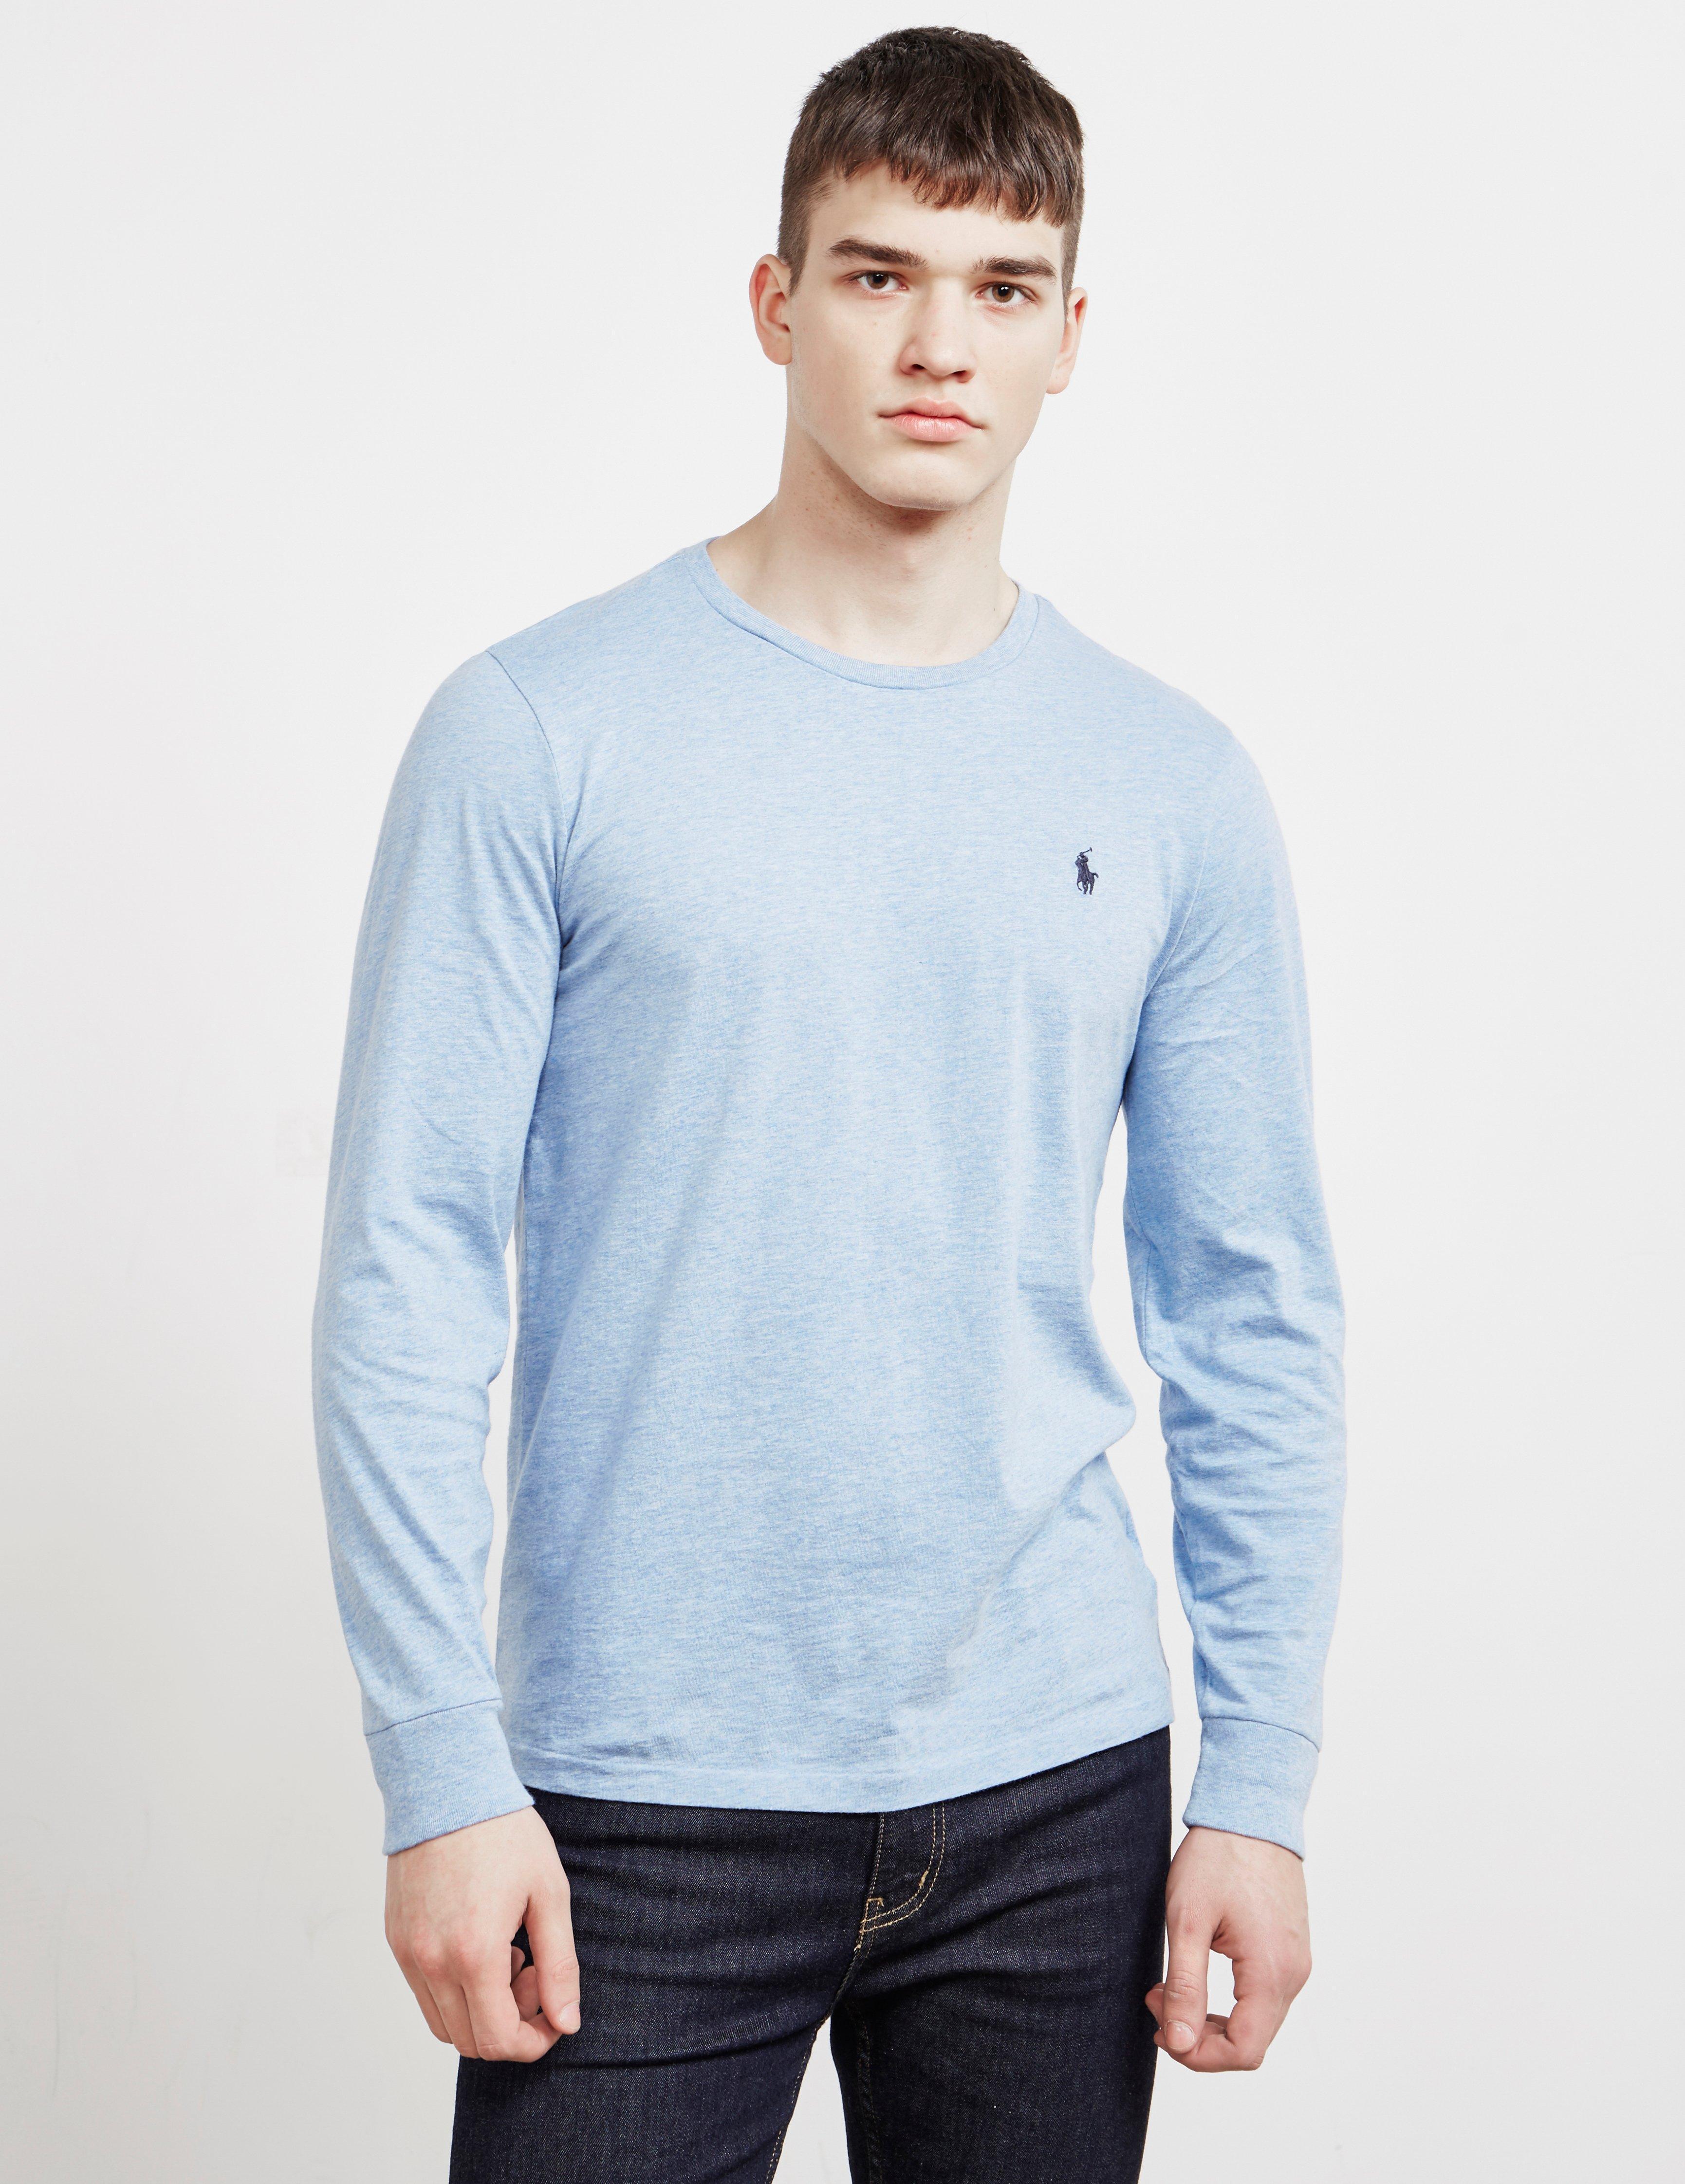 50a8ff9f7 Lyst - Polo Ralph Lauren Basic Long Sleeve T-shirt Blue in Blue for Men